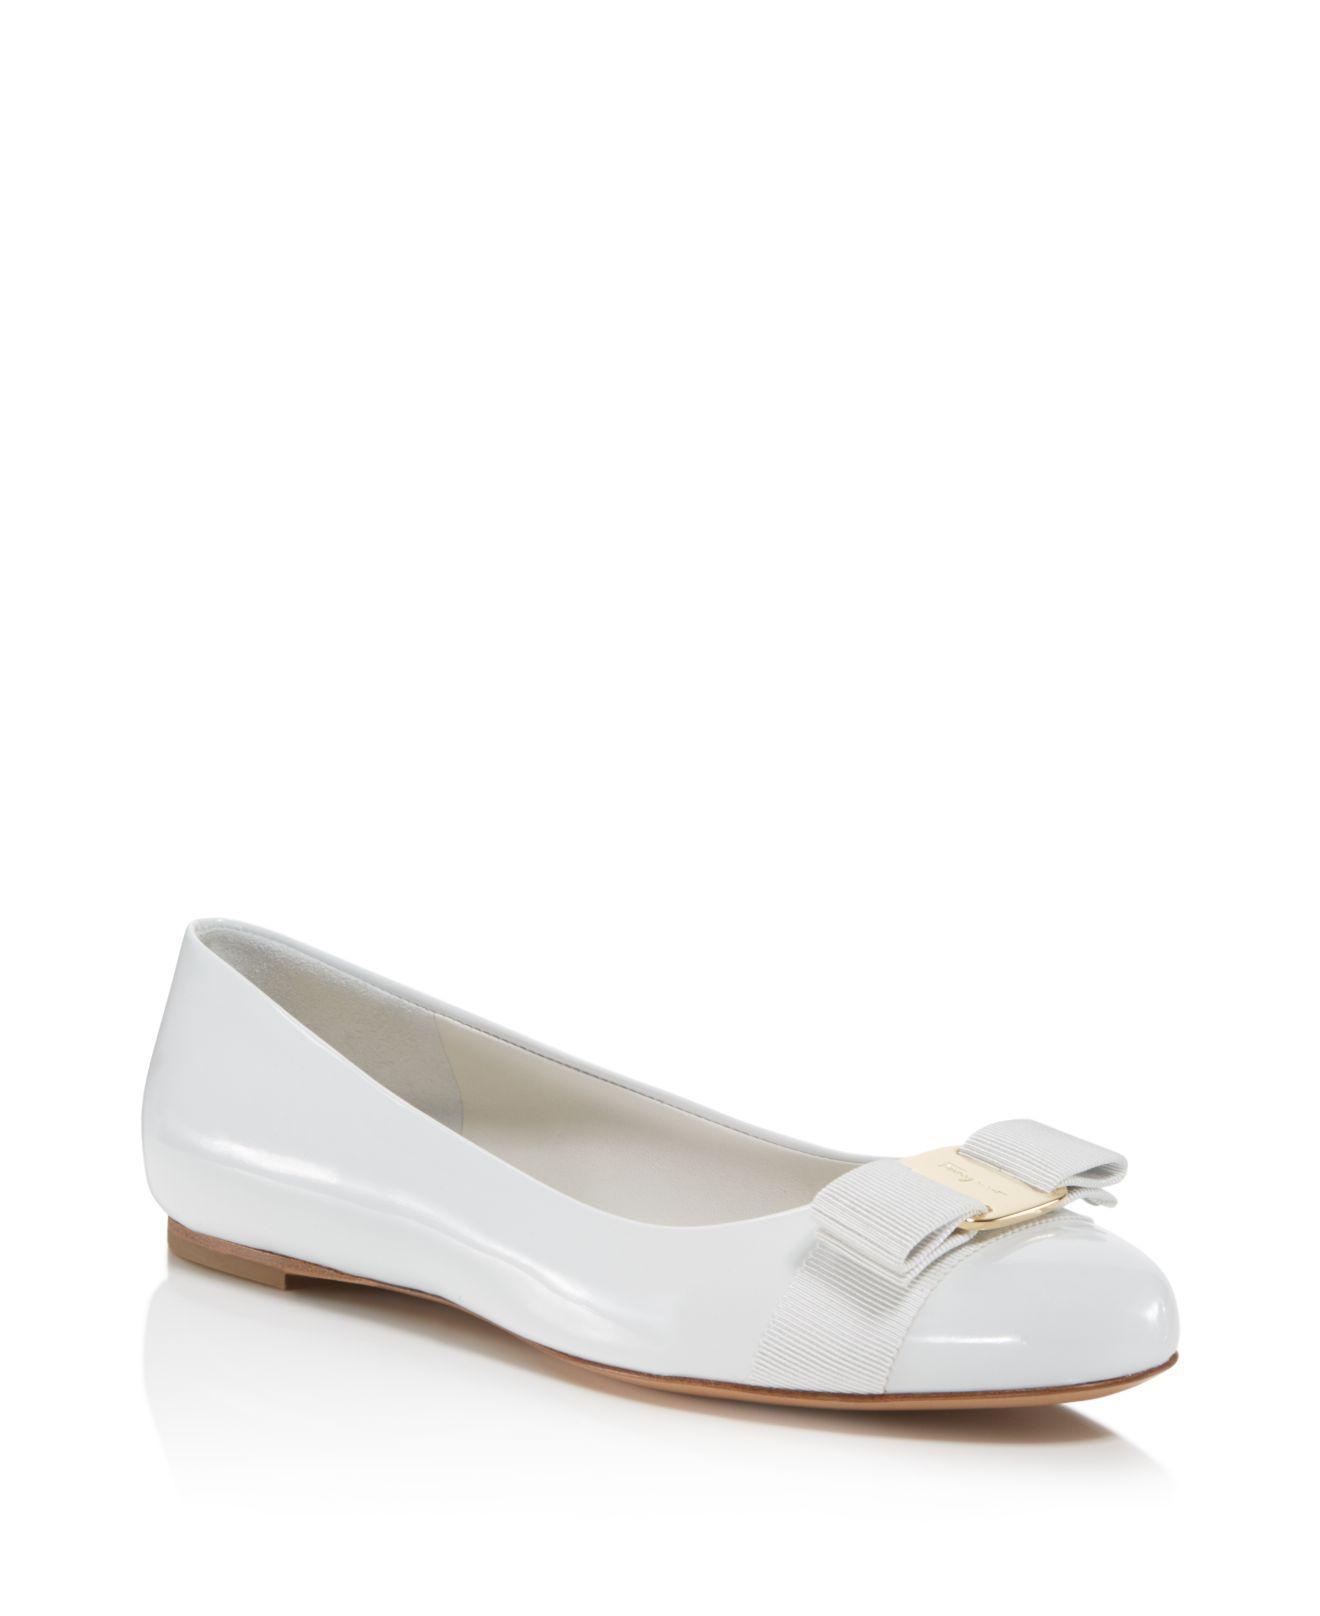 46e68f576d ferragamo-New-Bianco-WhiteGold-Womens -Varina-Patent-Leather-Ballet-Flats.jpeg